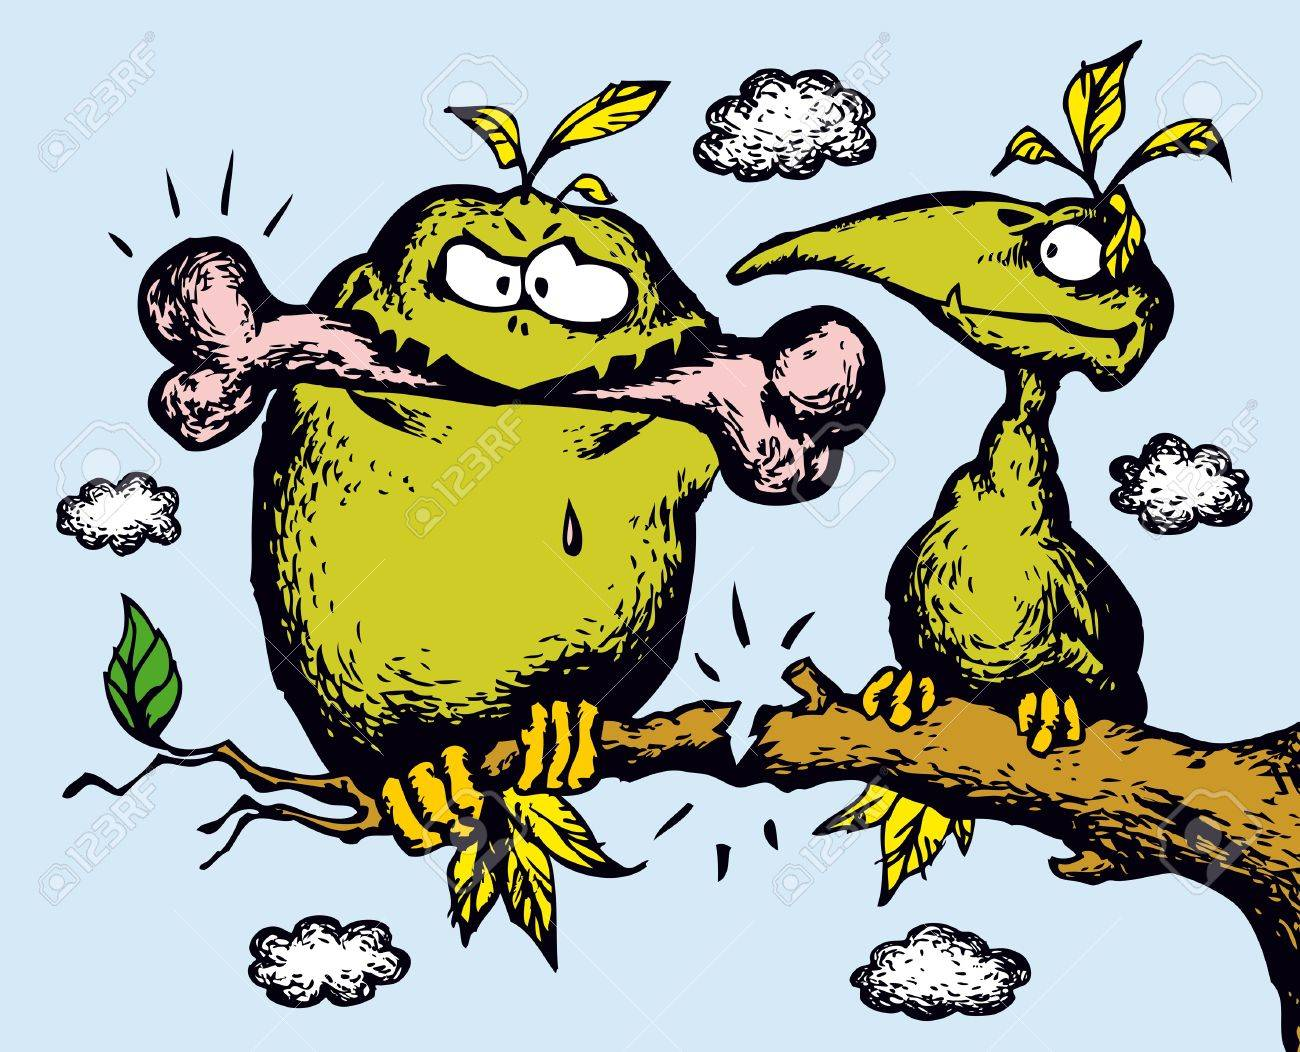 greed humor handdrawn cartoon illustrations drawing humorous Stock  Illustration - 8663676